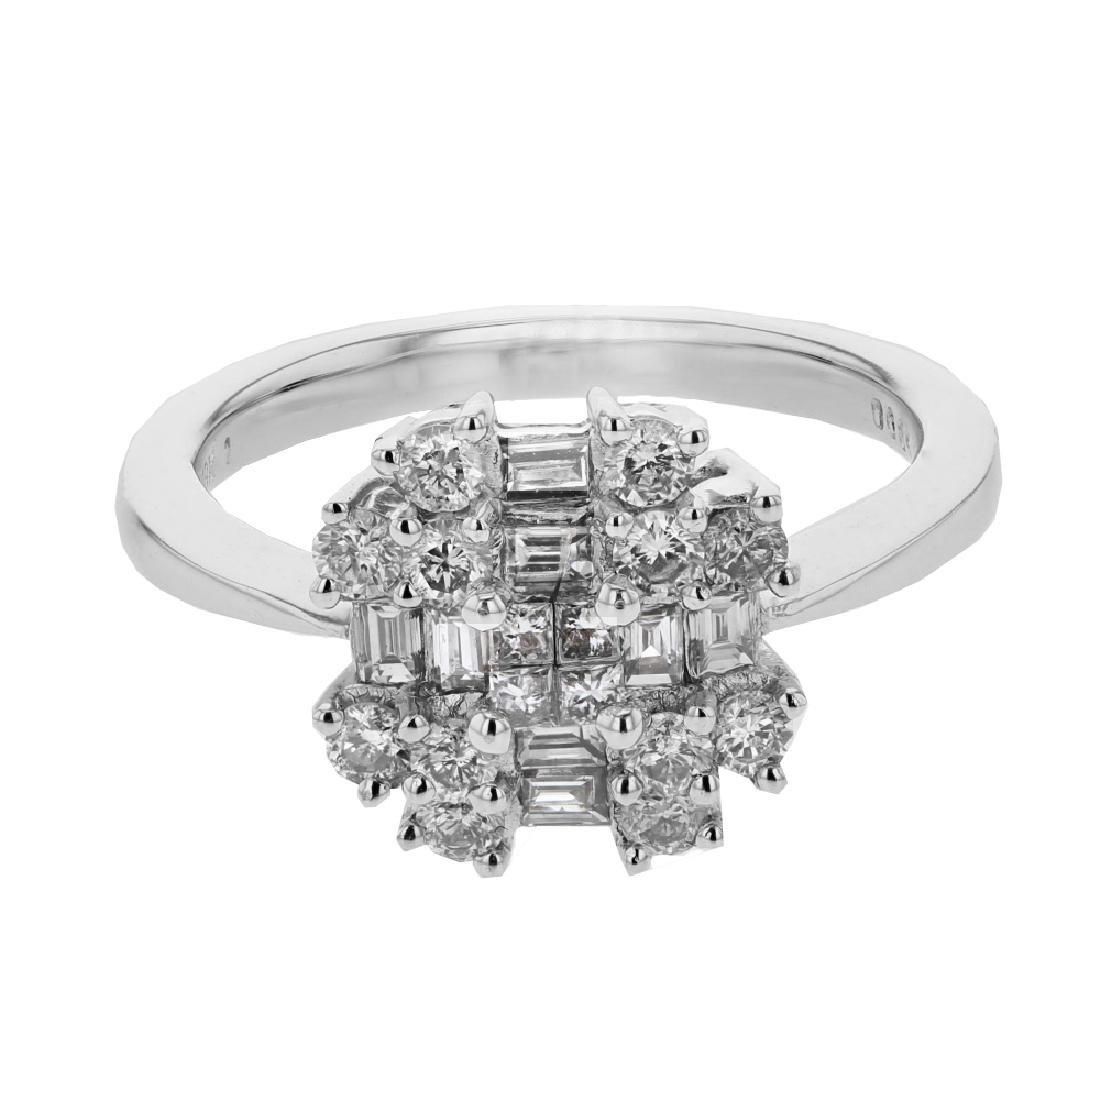 0.85 CTW Diamond Cocktail  Ring in 18K White Gold